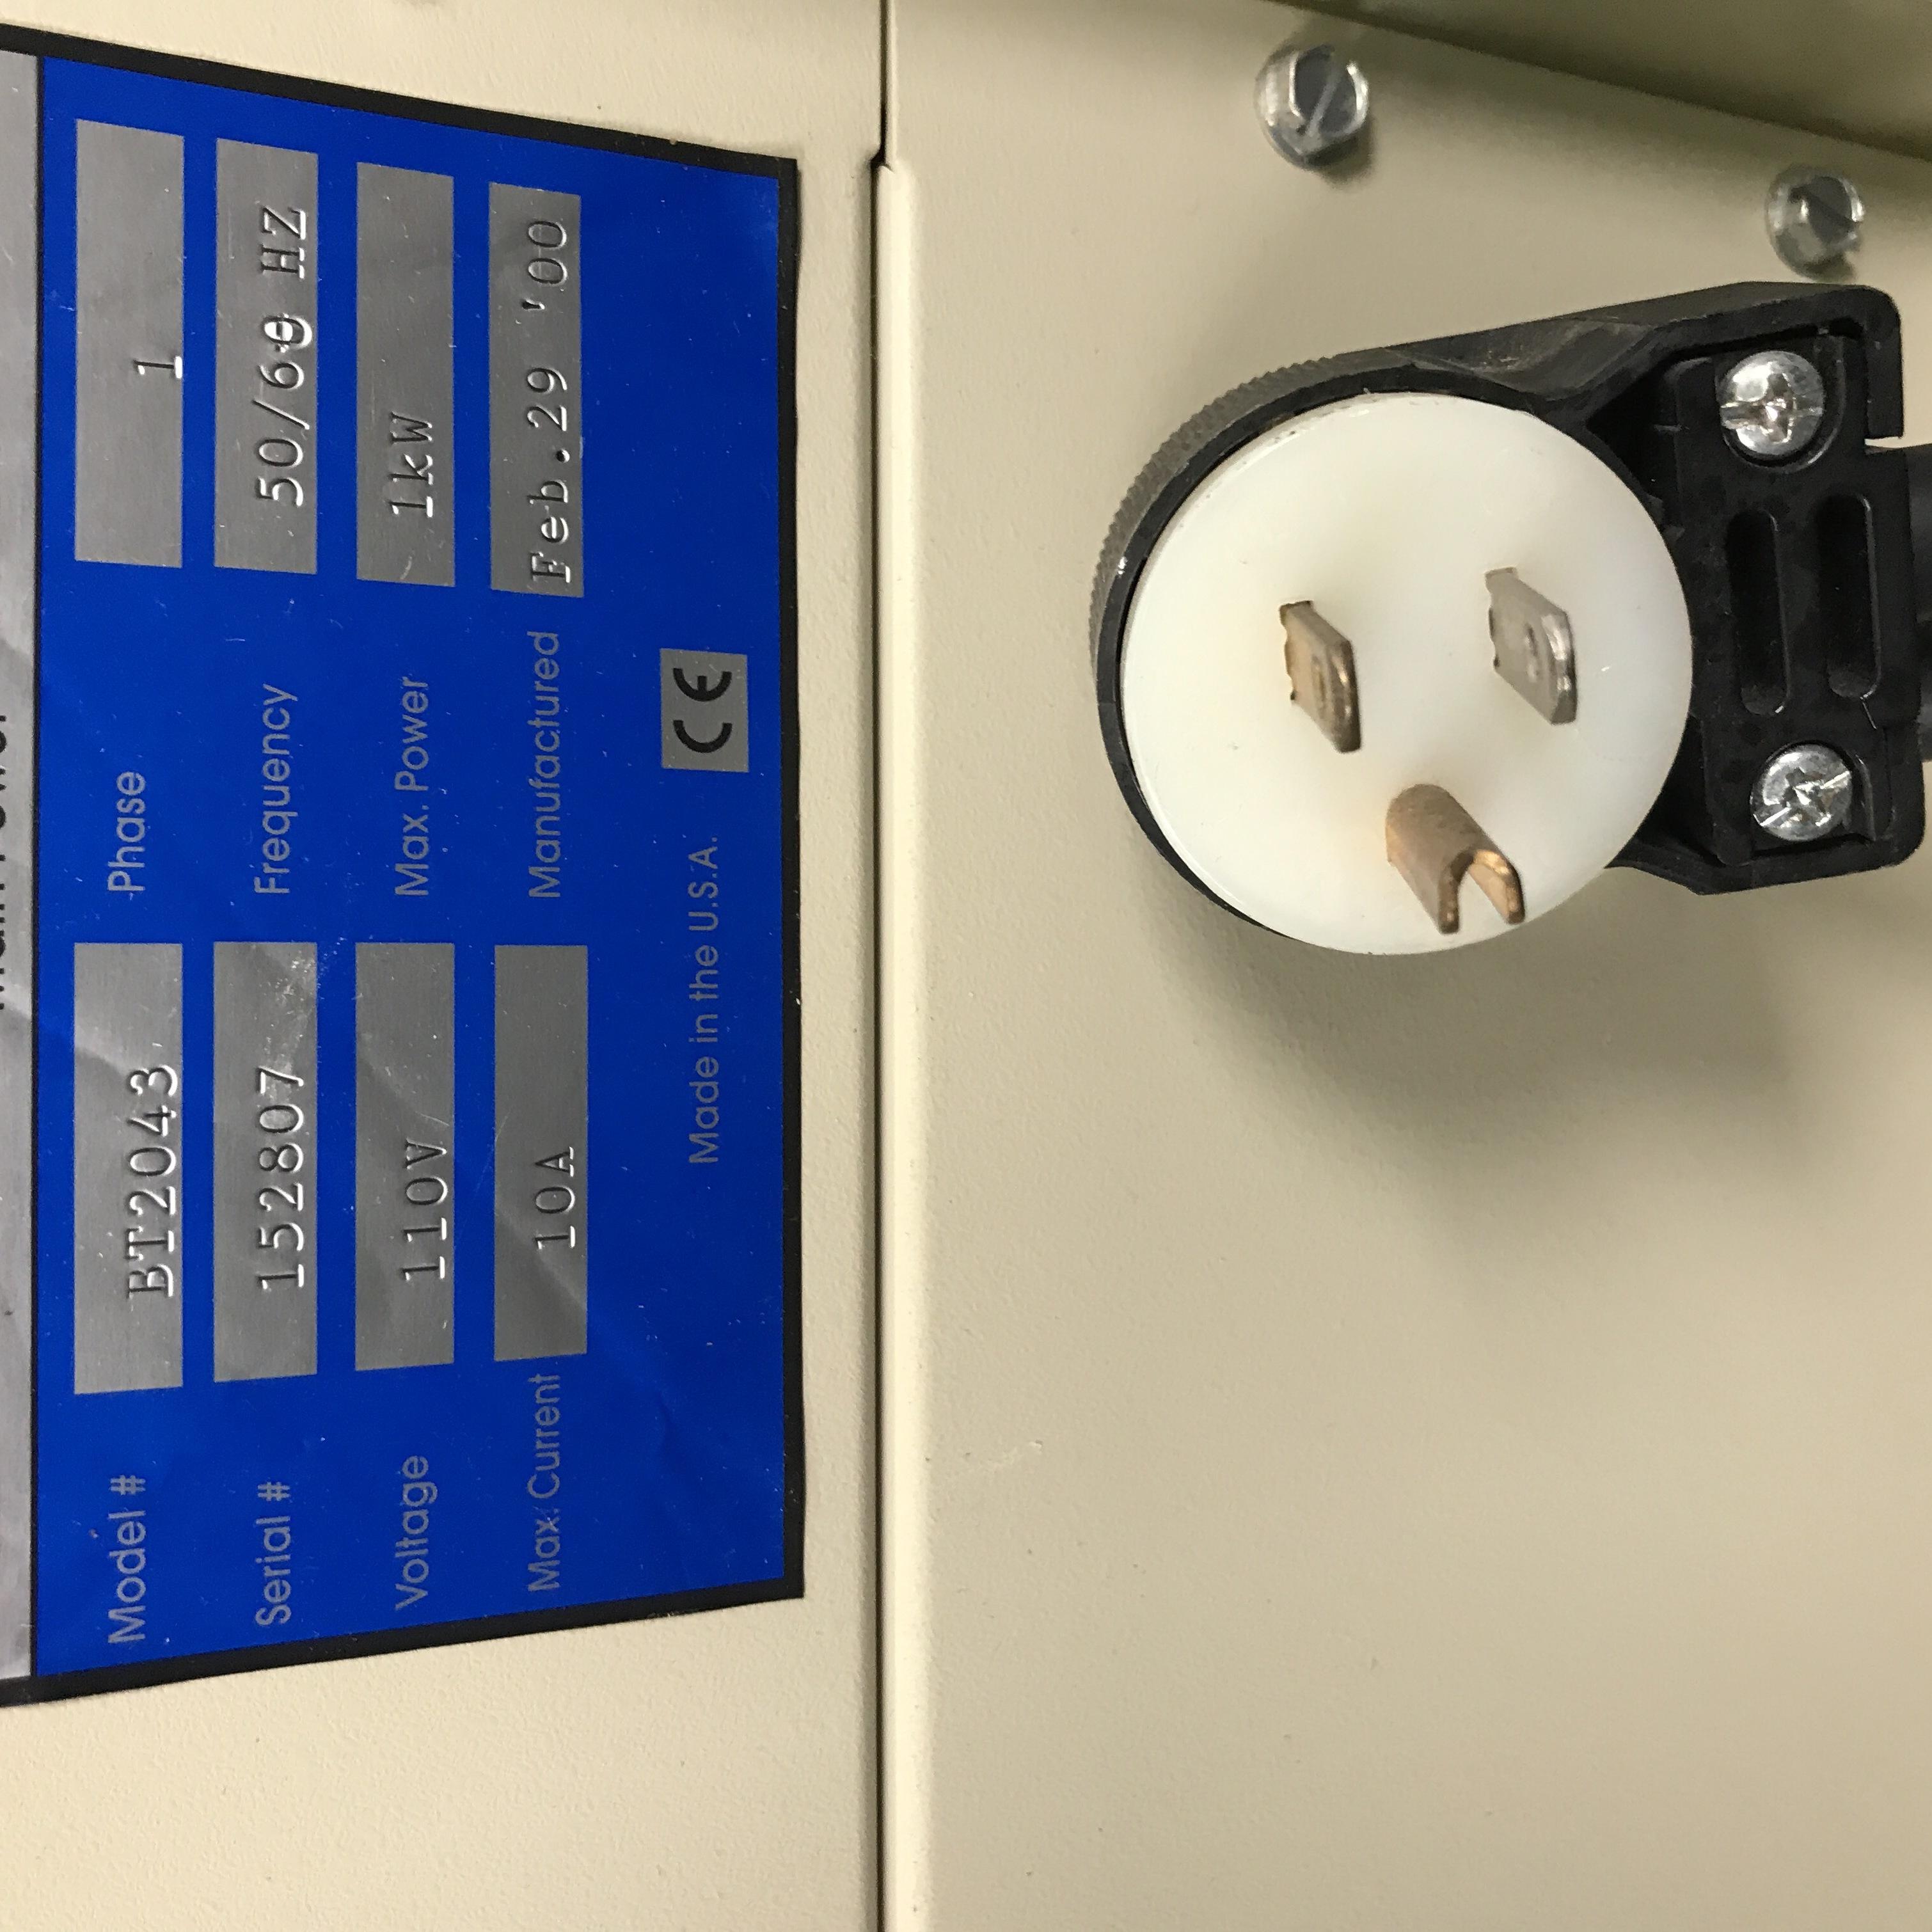 Arbin Instruments BT-2043 Battery Test System Image